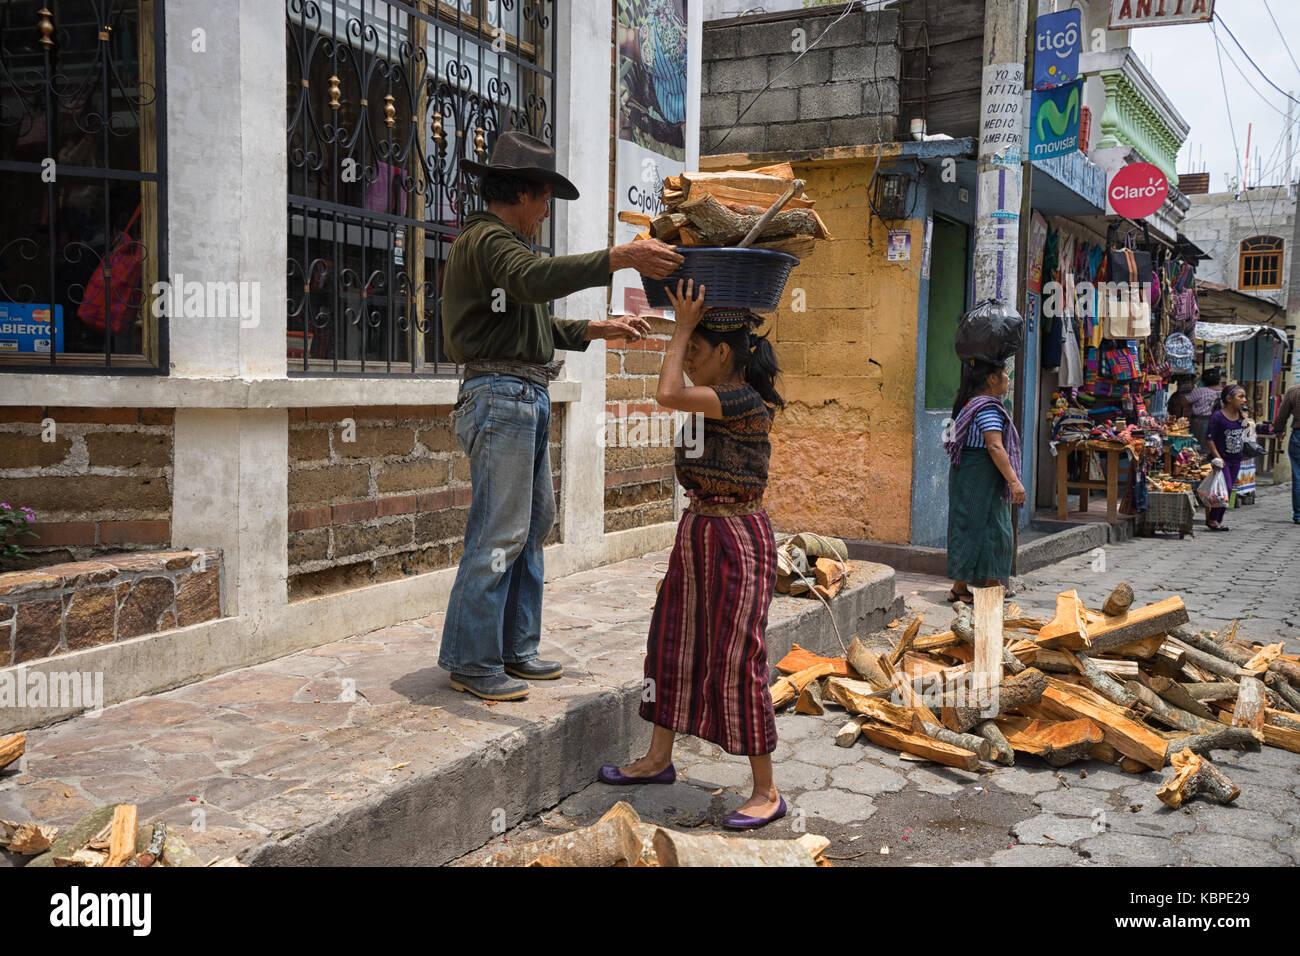 April 30, 2016 Santiago de Atitlan, Guatemala: man loads a basket full of firewood on the top of a woman's head - Stock Image